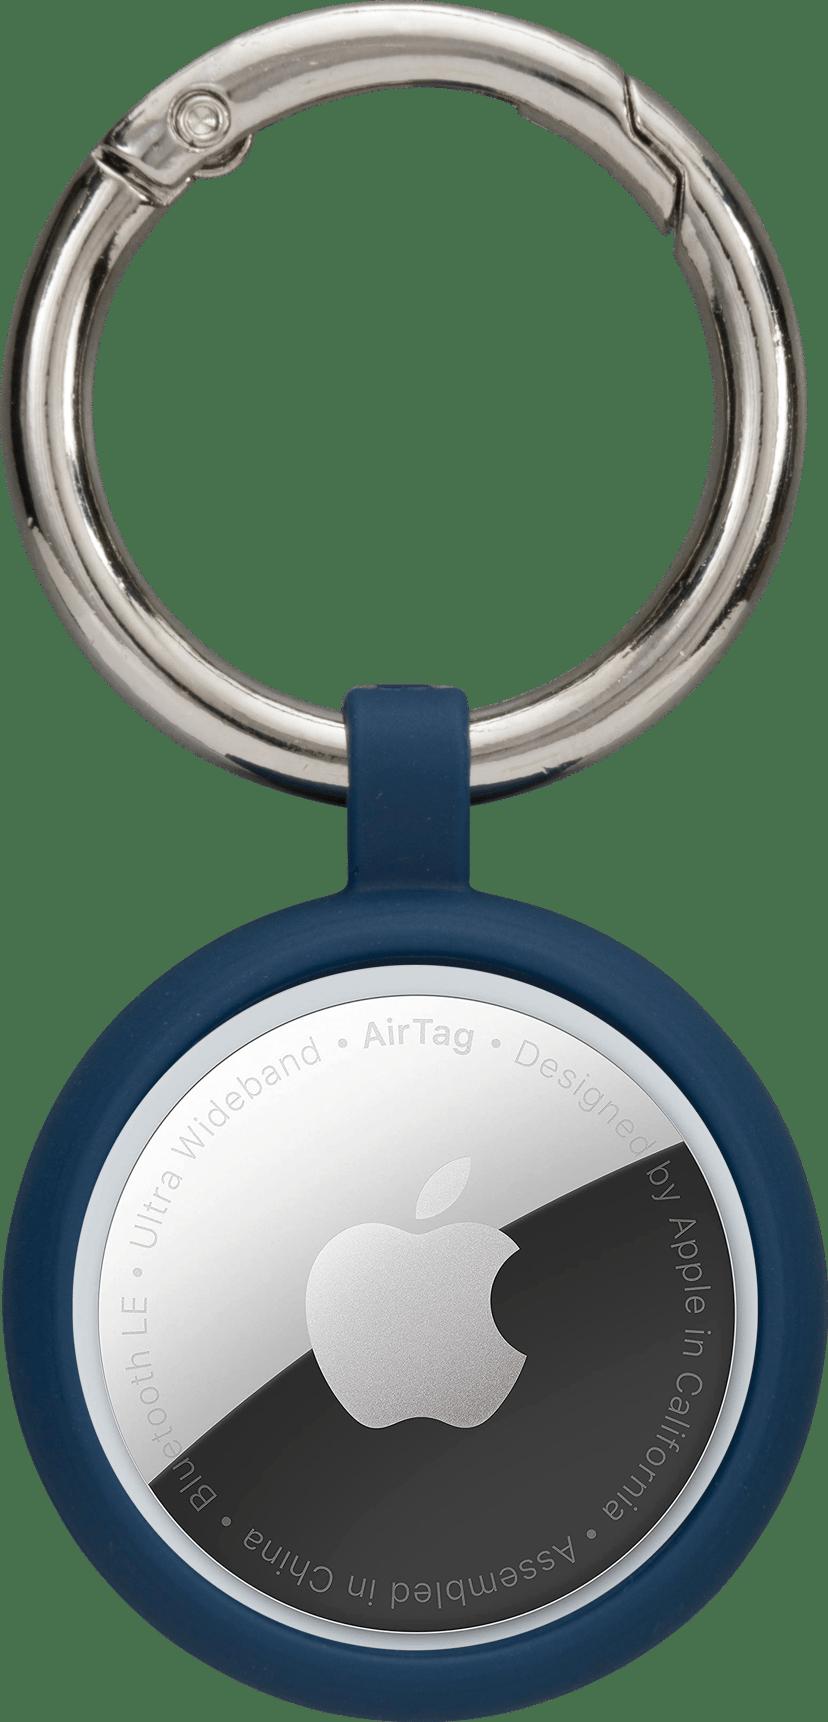 dbramante1928 Greenland Airtag Key Ring Pacific Blue